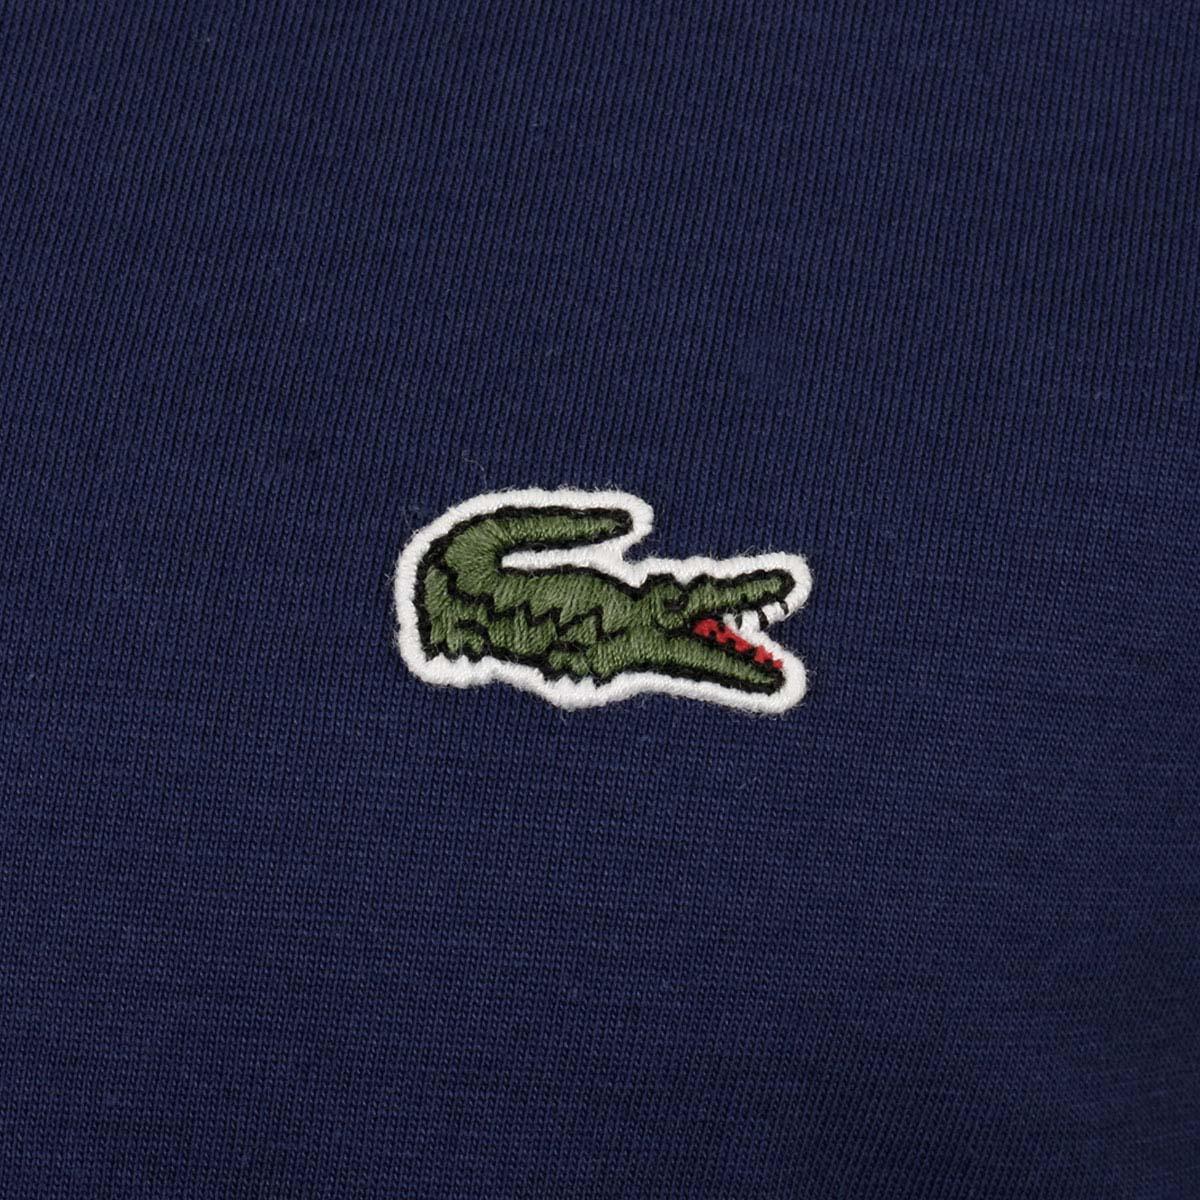 Lacoste-Mens-2019-SS-V-Neck-TH6710-Short-Sleeve-Pima-Cotton-Tee-T-Shirt thumbnail 17